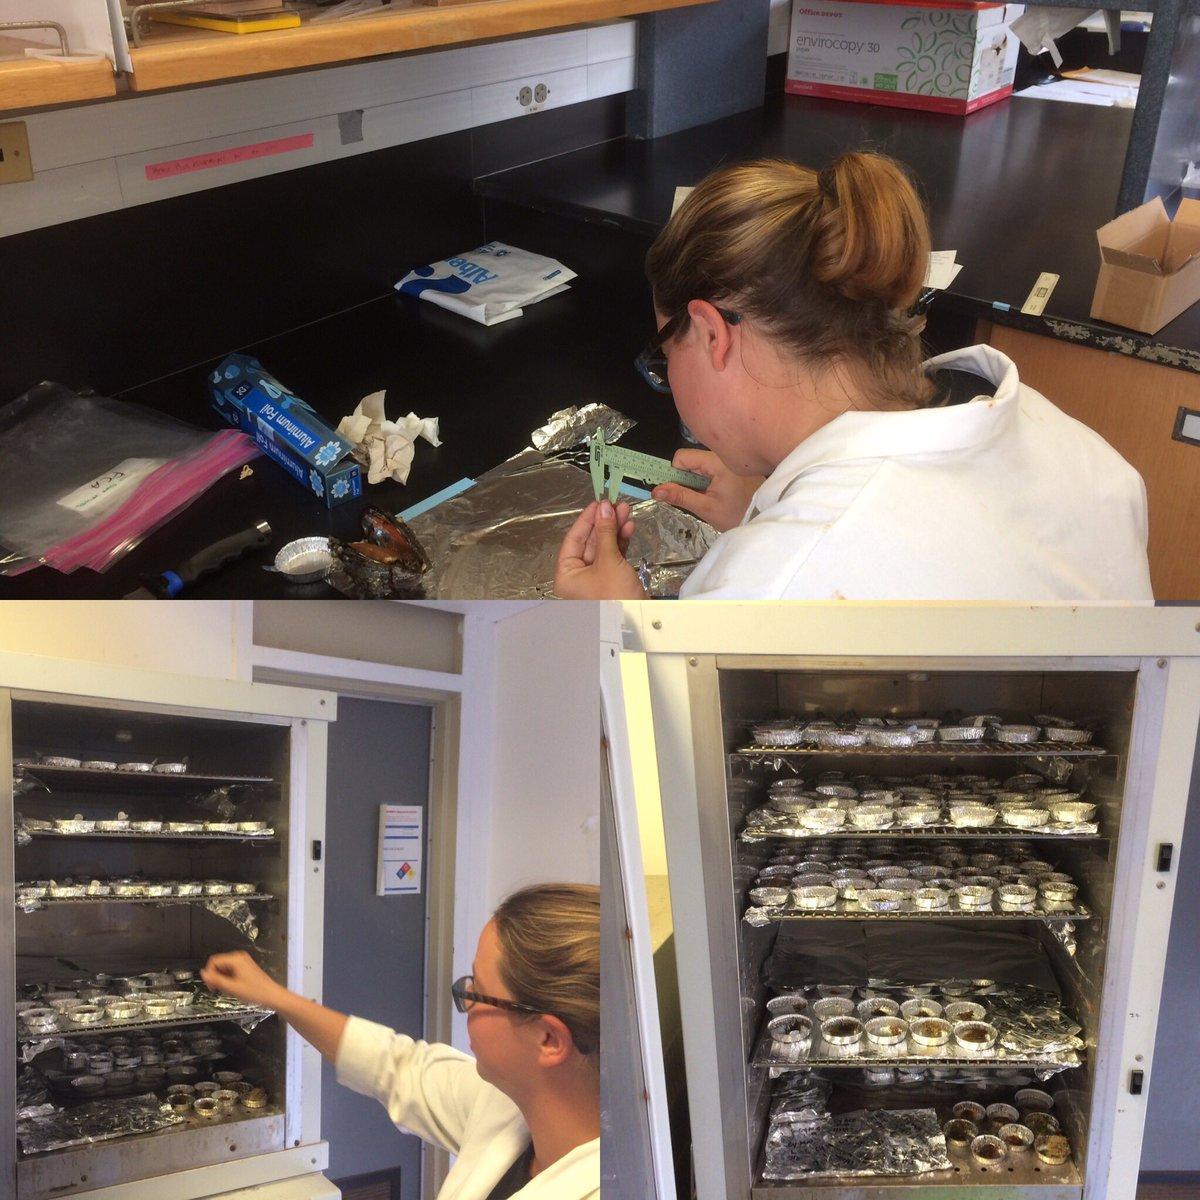 Another 26 hours in the life of a marine biologist. #csumb #catalina #marinebiology #usc #choosecsu<br>http://pic.twitter.com/EvjbTMztl2 &ndash; bij USC Wrigley Marine Institute